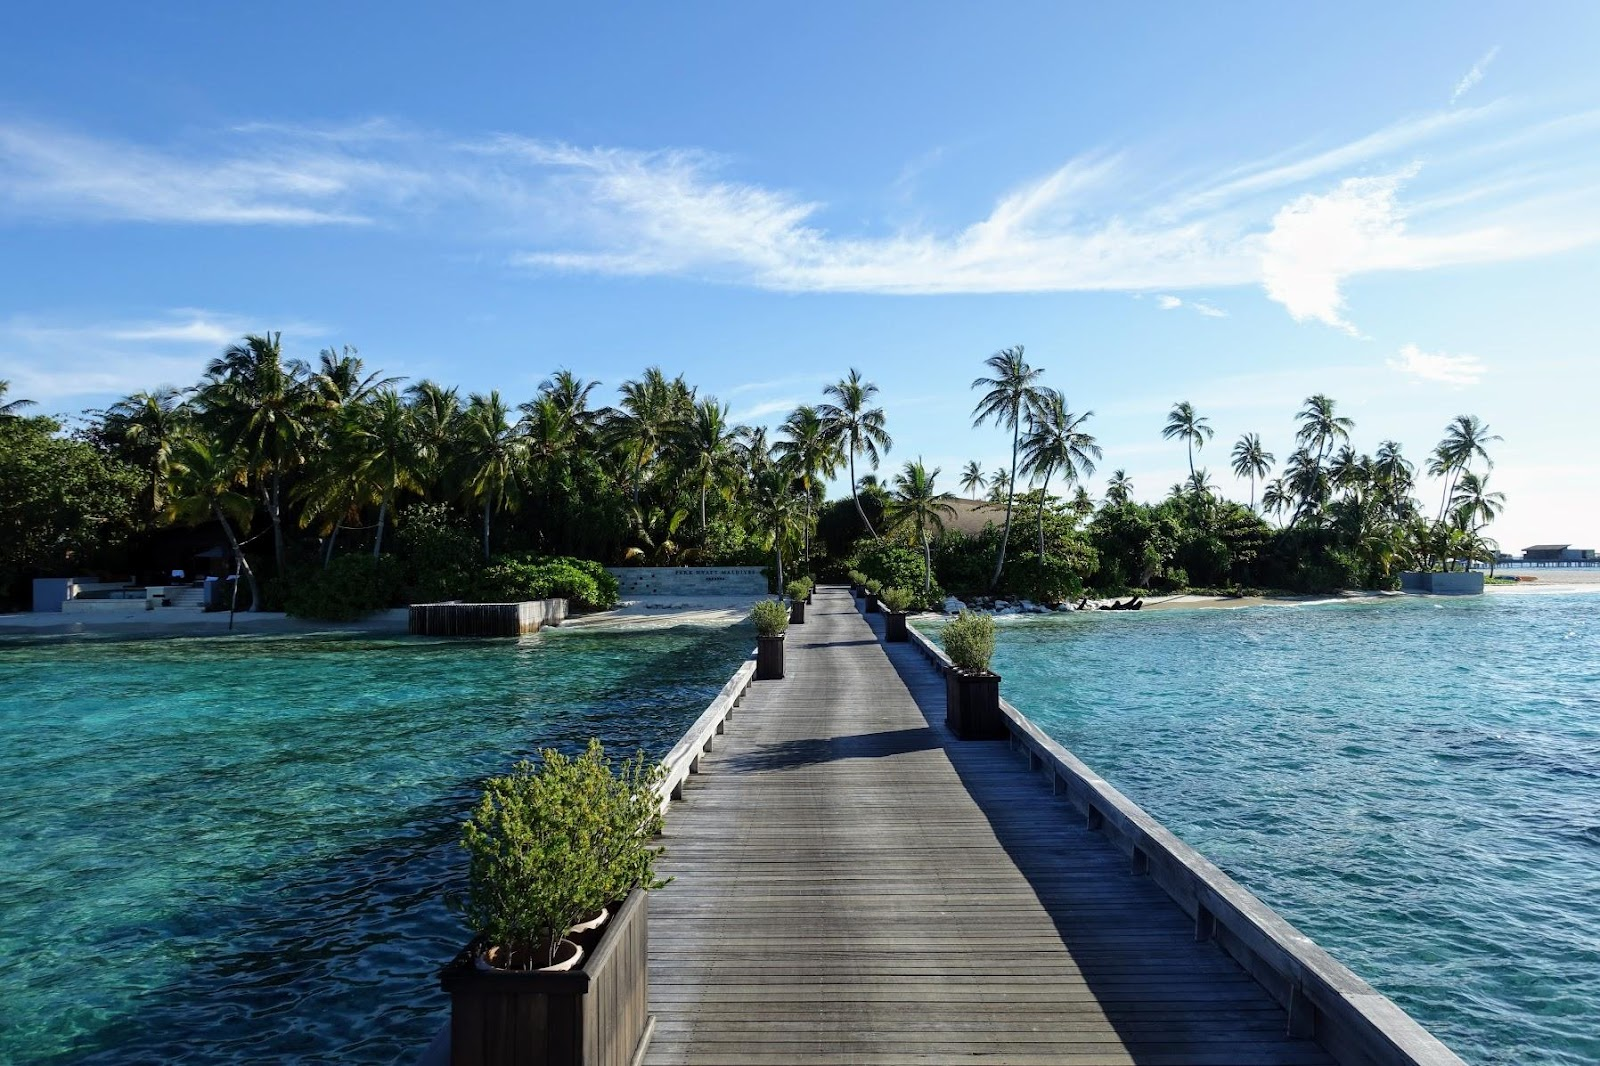 8VGqzT42i9QRpw5WaTZcqoBPXtcvh9s5tnLIgPQWP43T0SxMxREndwRLVE7yxb7bzwl5e0w1N8SRyFDZFTnj9cy6oR5dOoZp0k8ngSMDYEVPn25kIqhACdUc jhr5RWTbarUw1Kf 21Hotels: Park Hyatt Maldives Hadahaa- лукс, устойчивост, екзотика